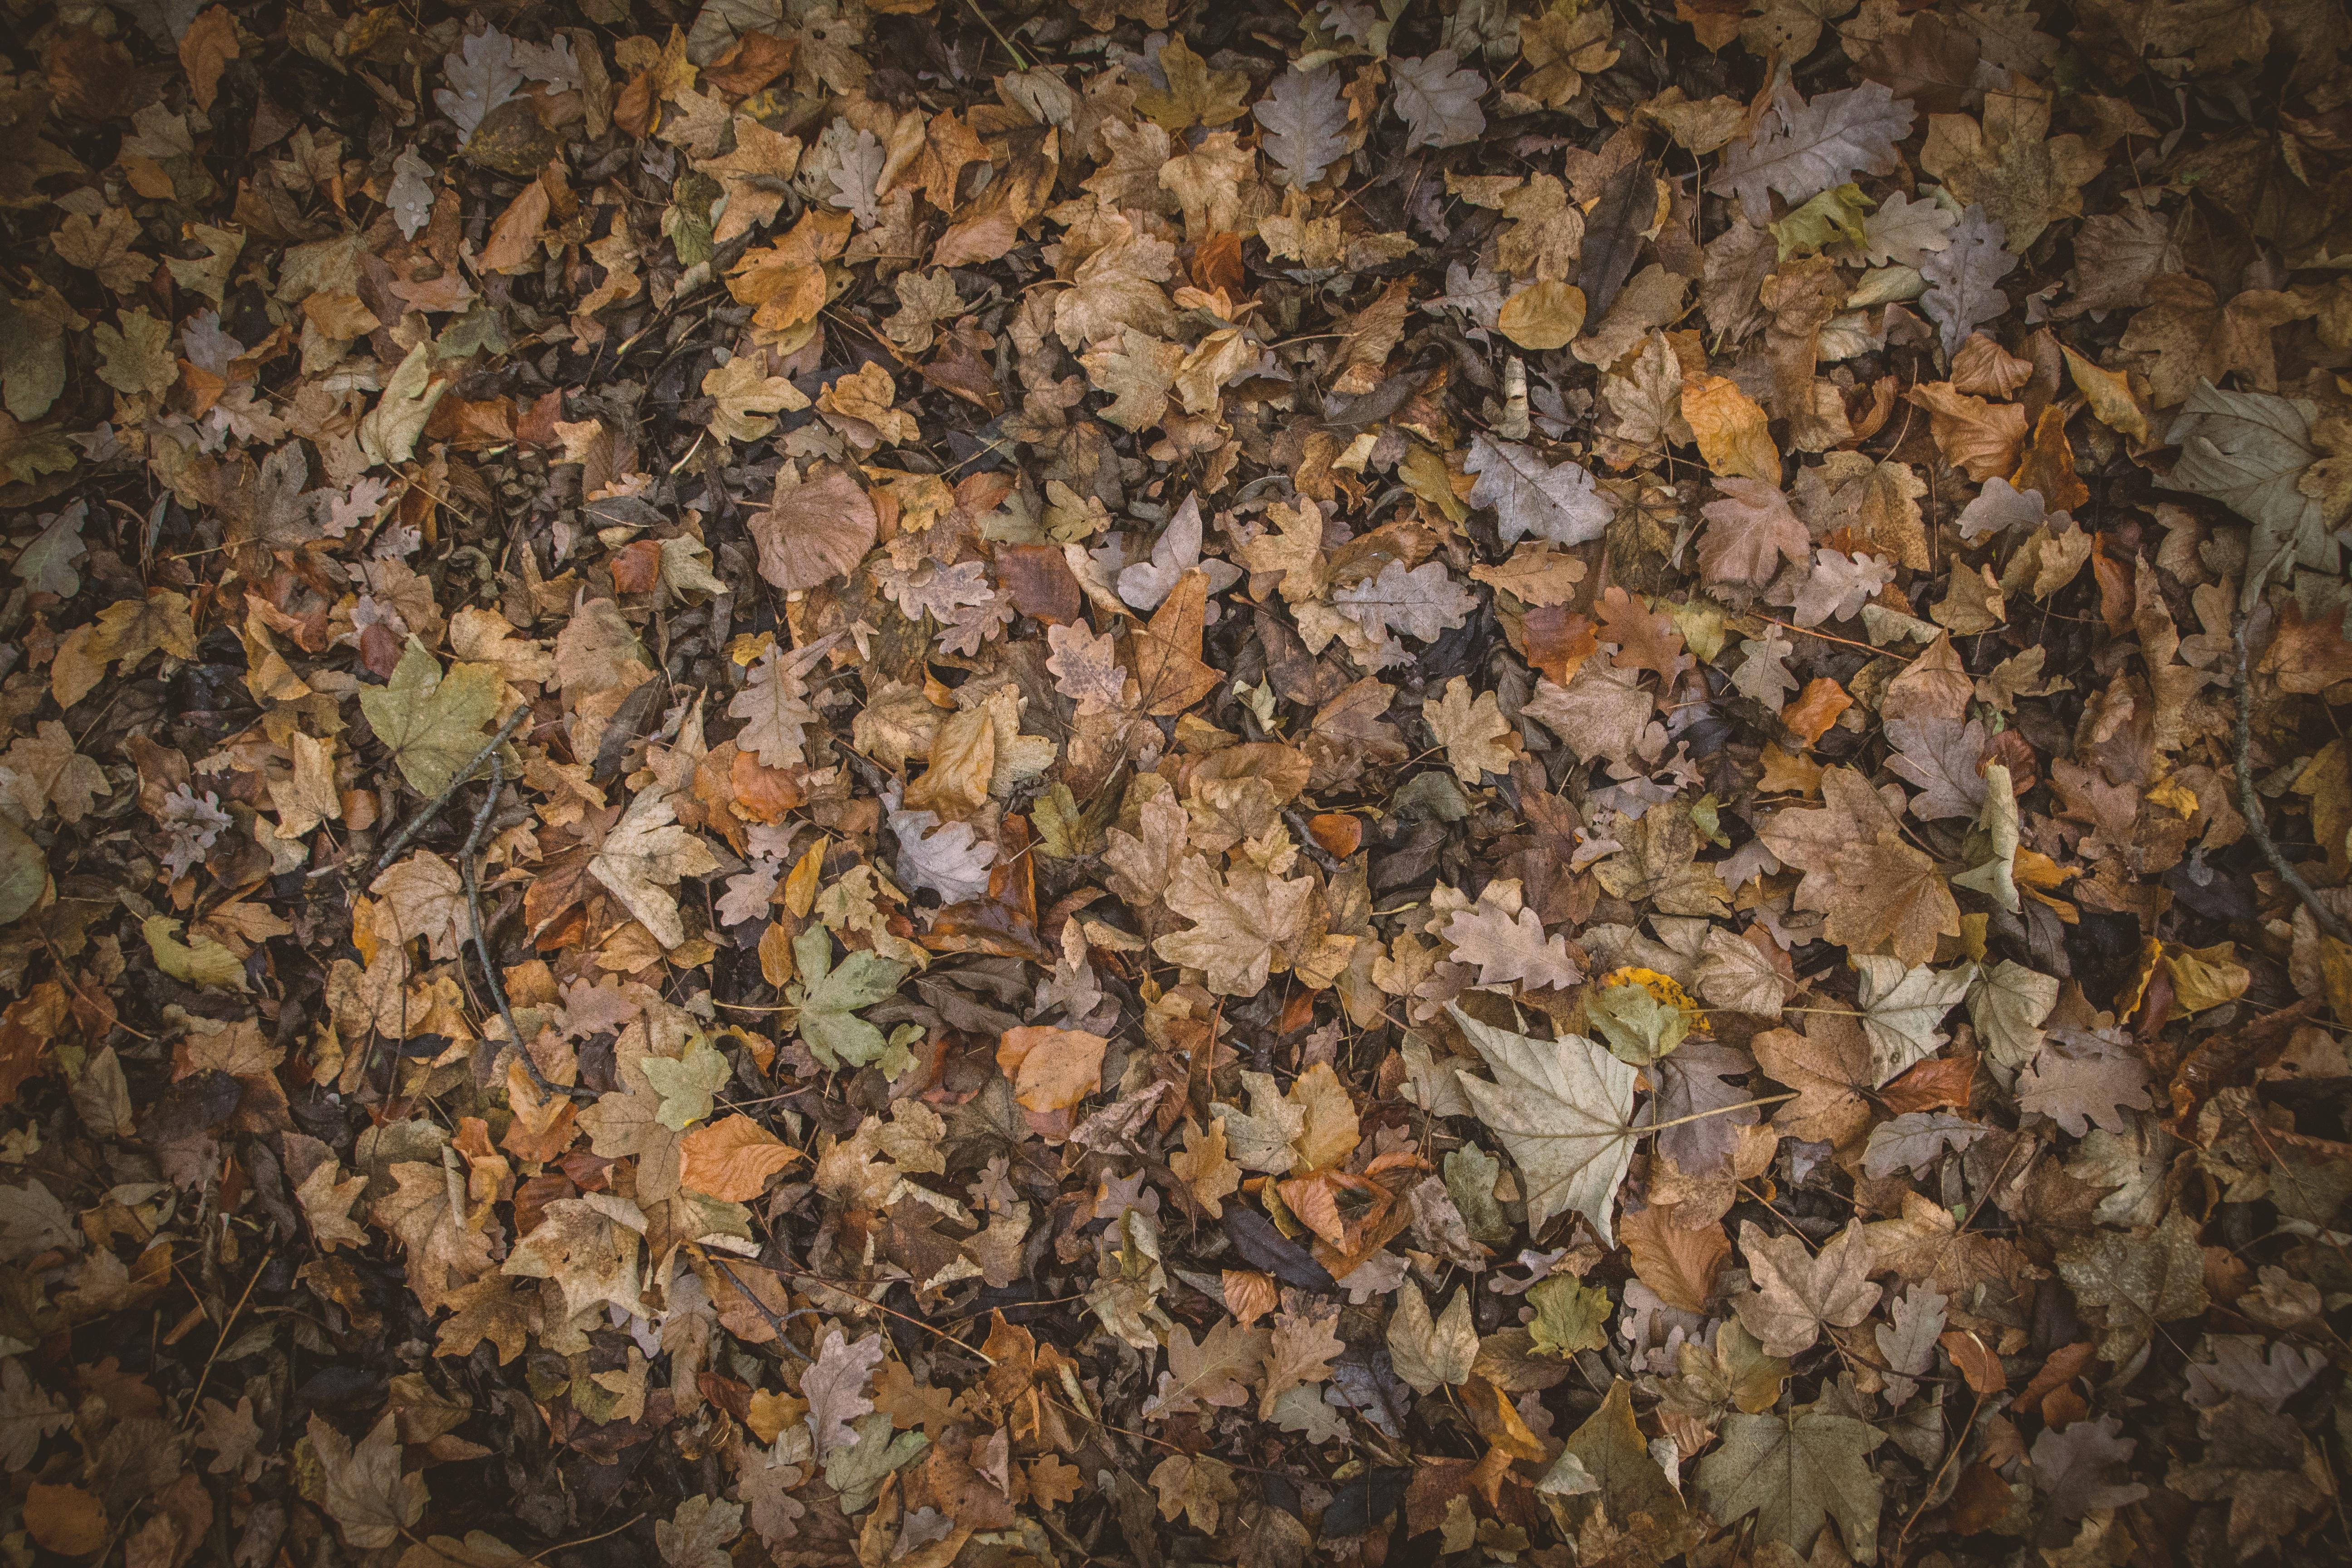 rock wood texture leaf pattern autumn brown soil material design autumn leaves autumn colours autumnal nature photography flooring hd wallpaper 1364183